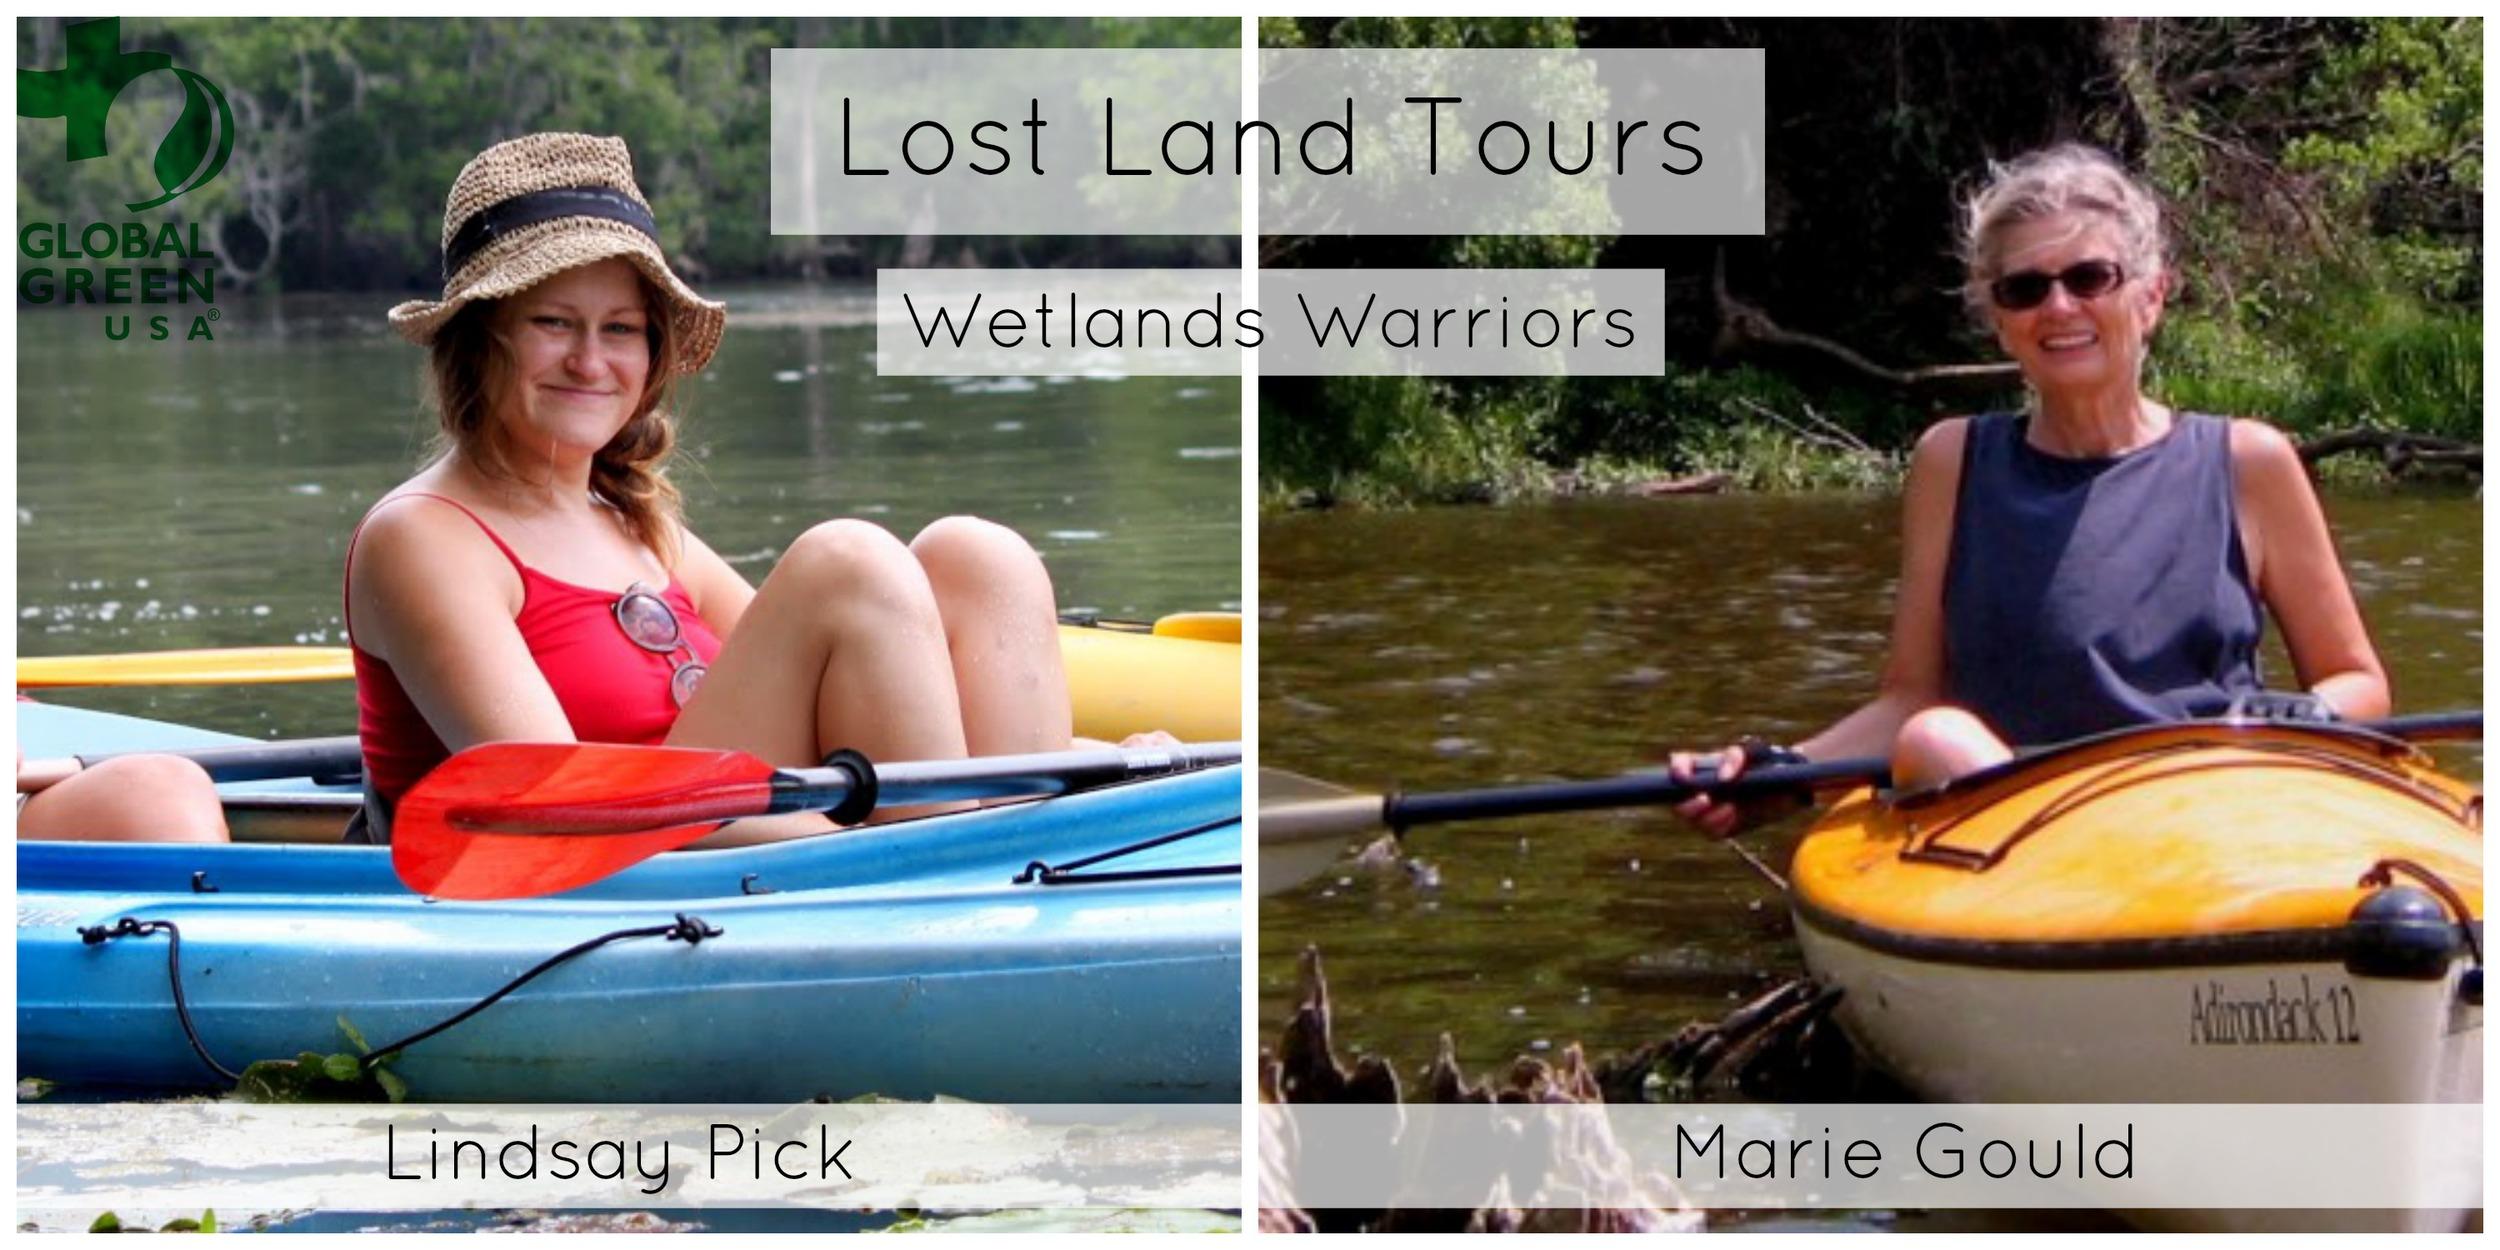 Global Green USA Wetlands Warriors Lost Lands Tours